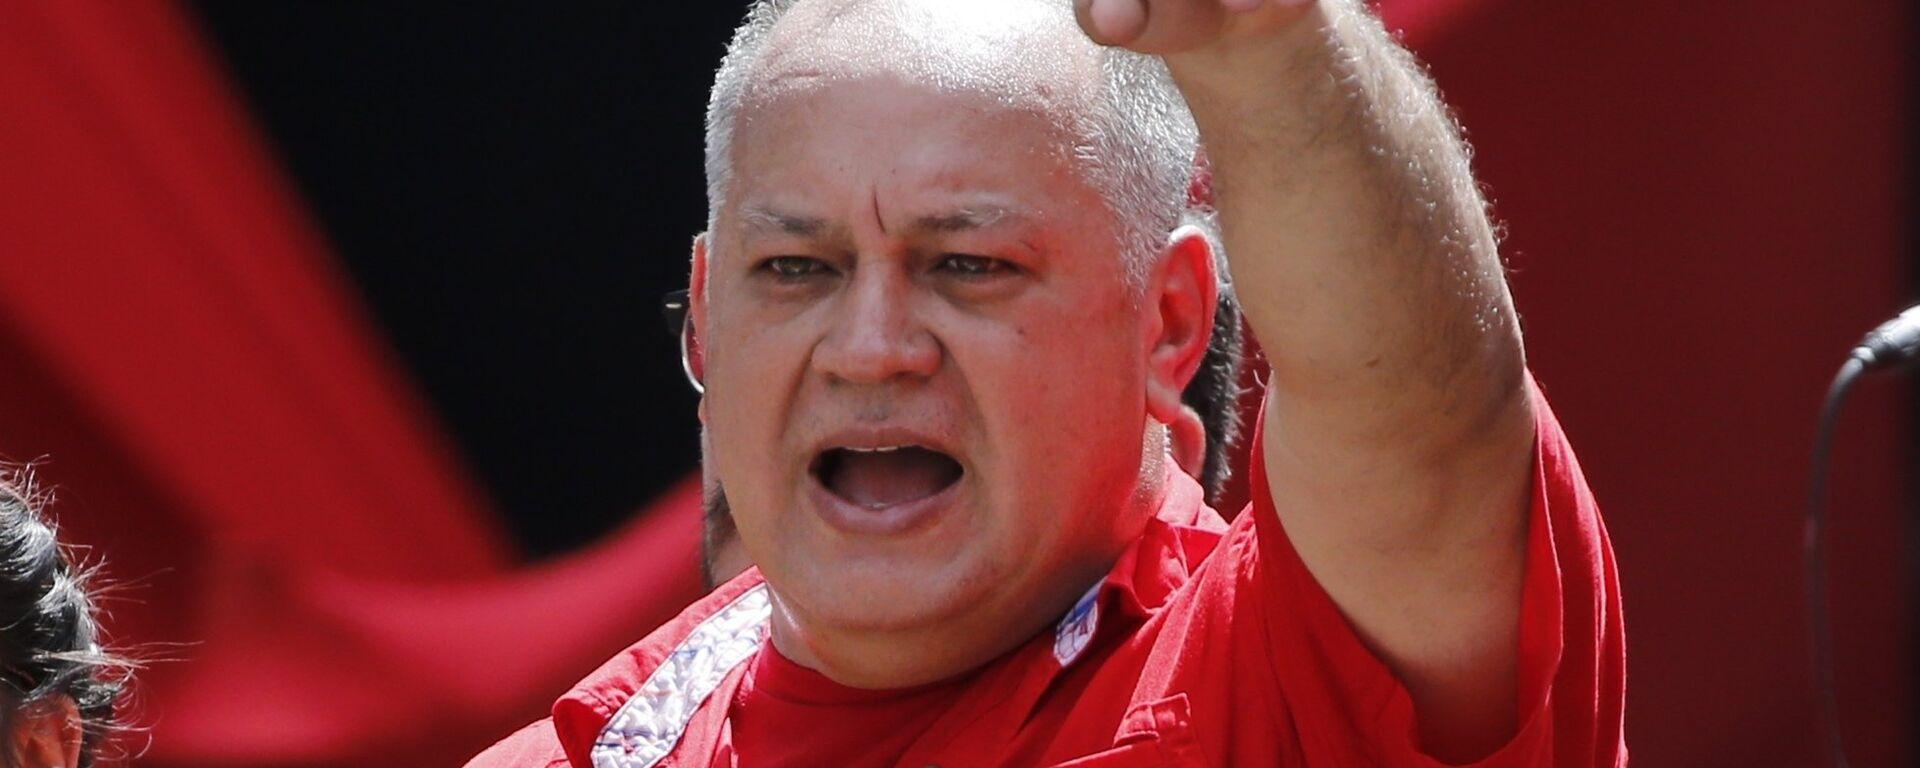 Diosdado Cabello, presidente de la Asamblea Nacional Constituyente de Venezuela - Sputnik Mundo, 1920, 05.03.2021